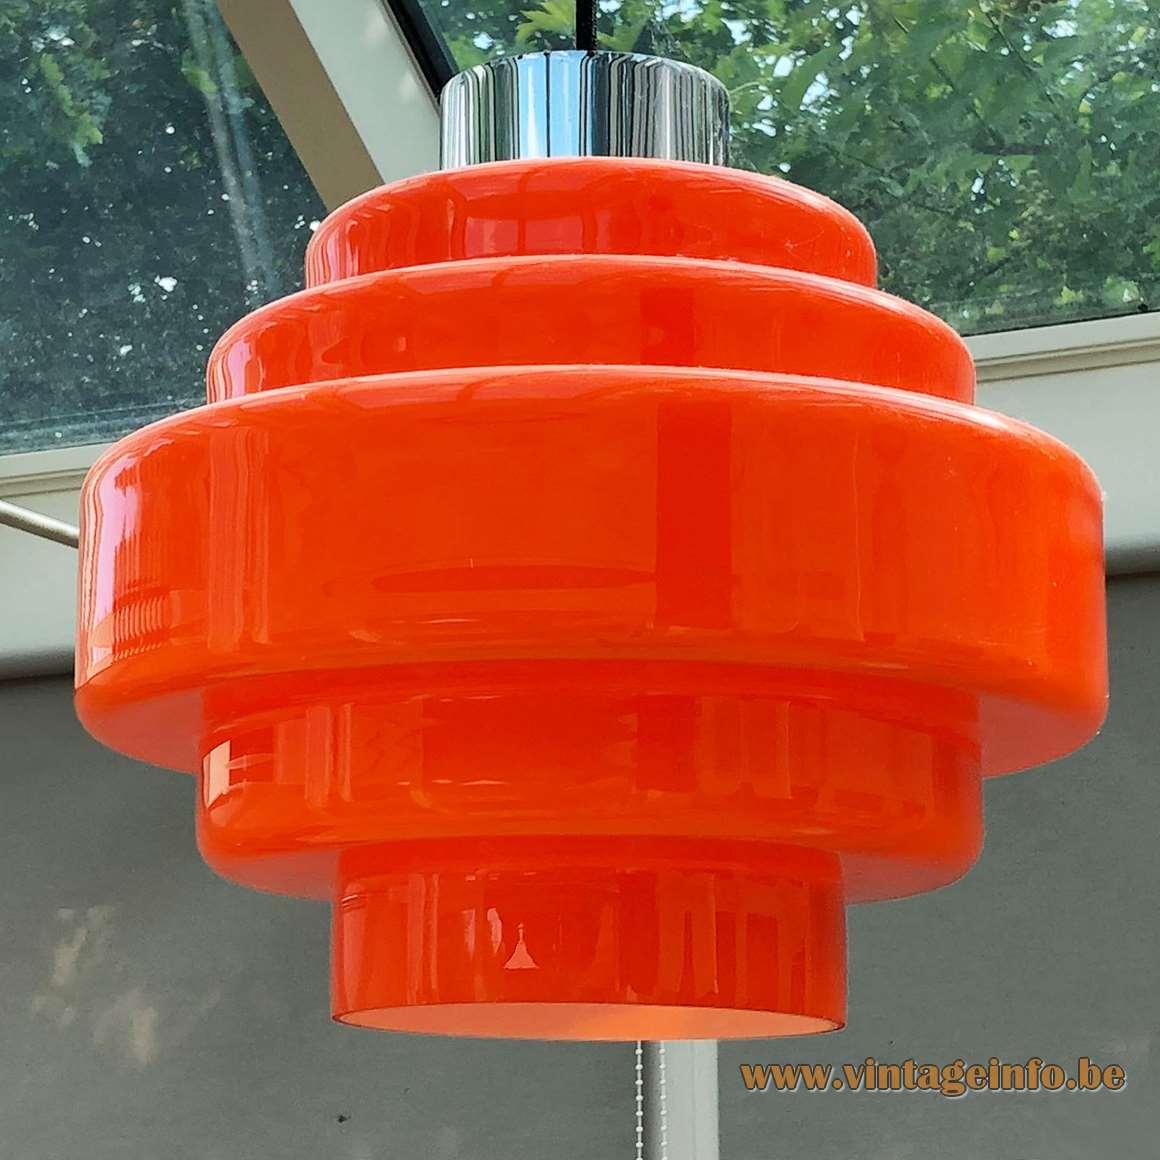 Herwig & Frank Sterckx pendant lamp designed for De Rupel Glass, Boom in 1968 – 1969